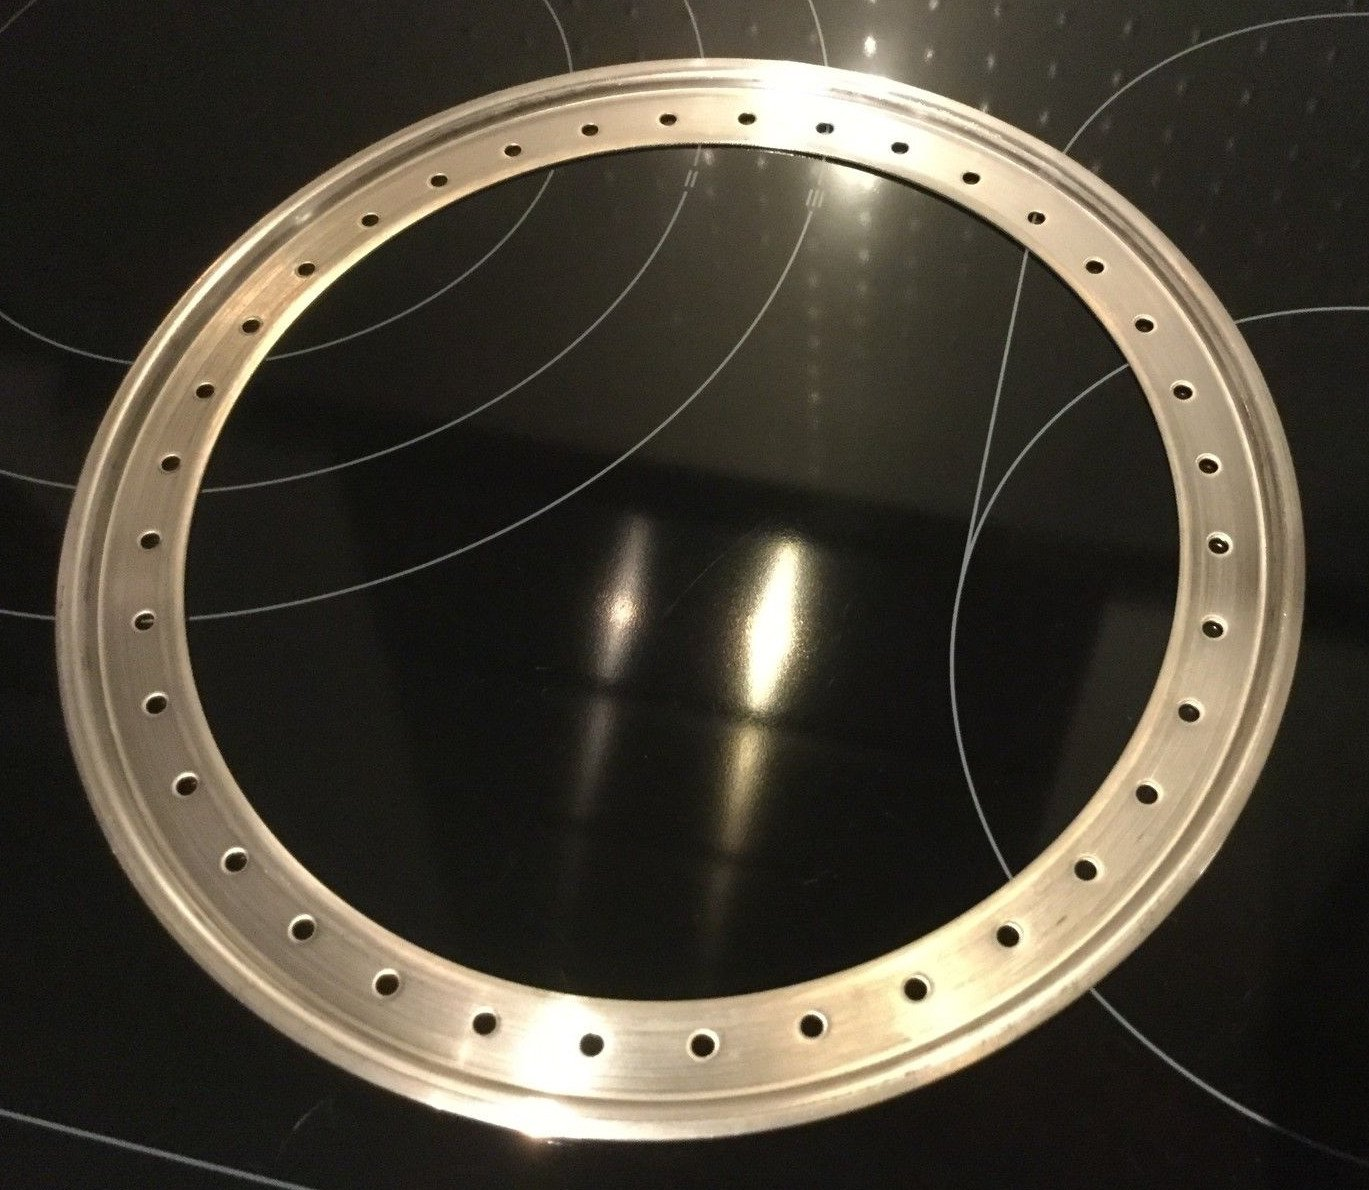 Set of 2 Vaessen Creative 1.5-5 mm Plus 6-10 mm Jump Ring Mandrel